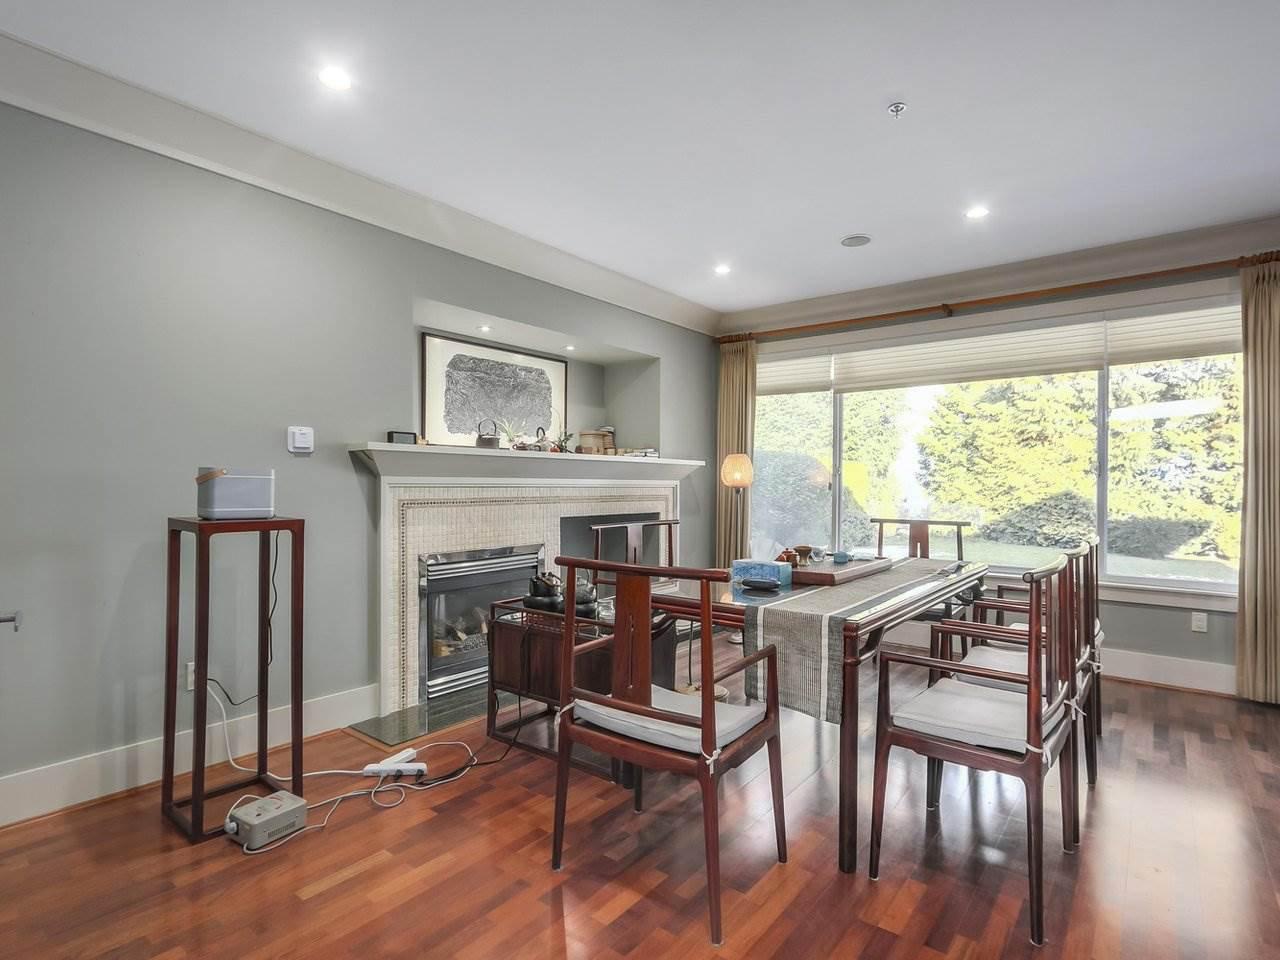 Photo 7: Photos: 5441 WEST VISTA COURT in West Vancouver: Upper Caulfeild House for sale : MLS®# R2341877